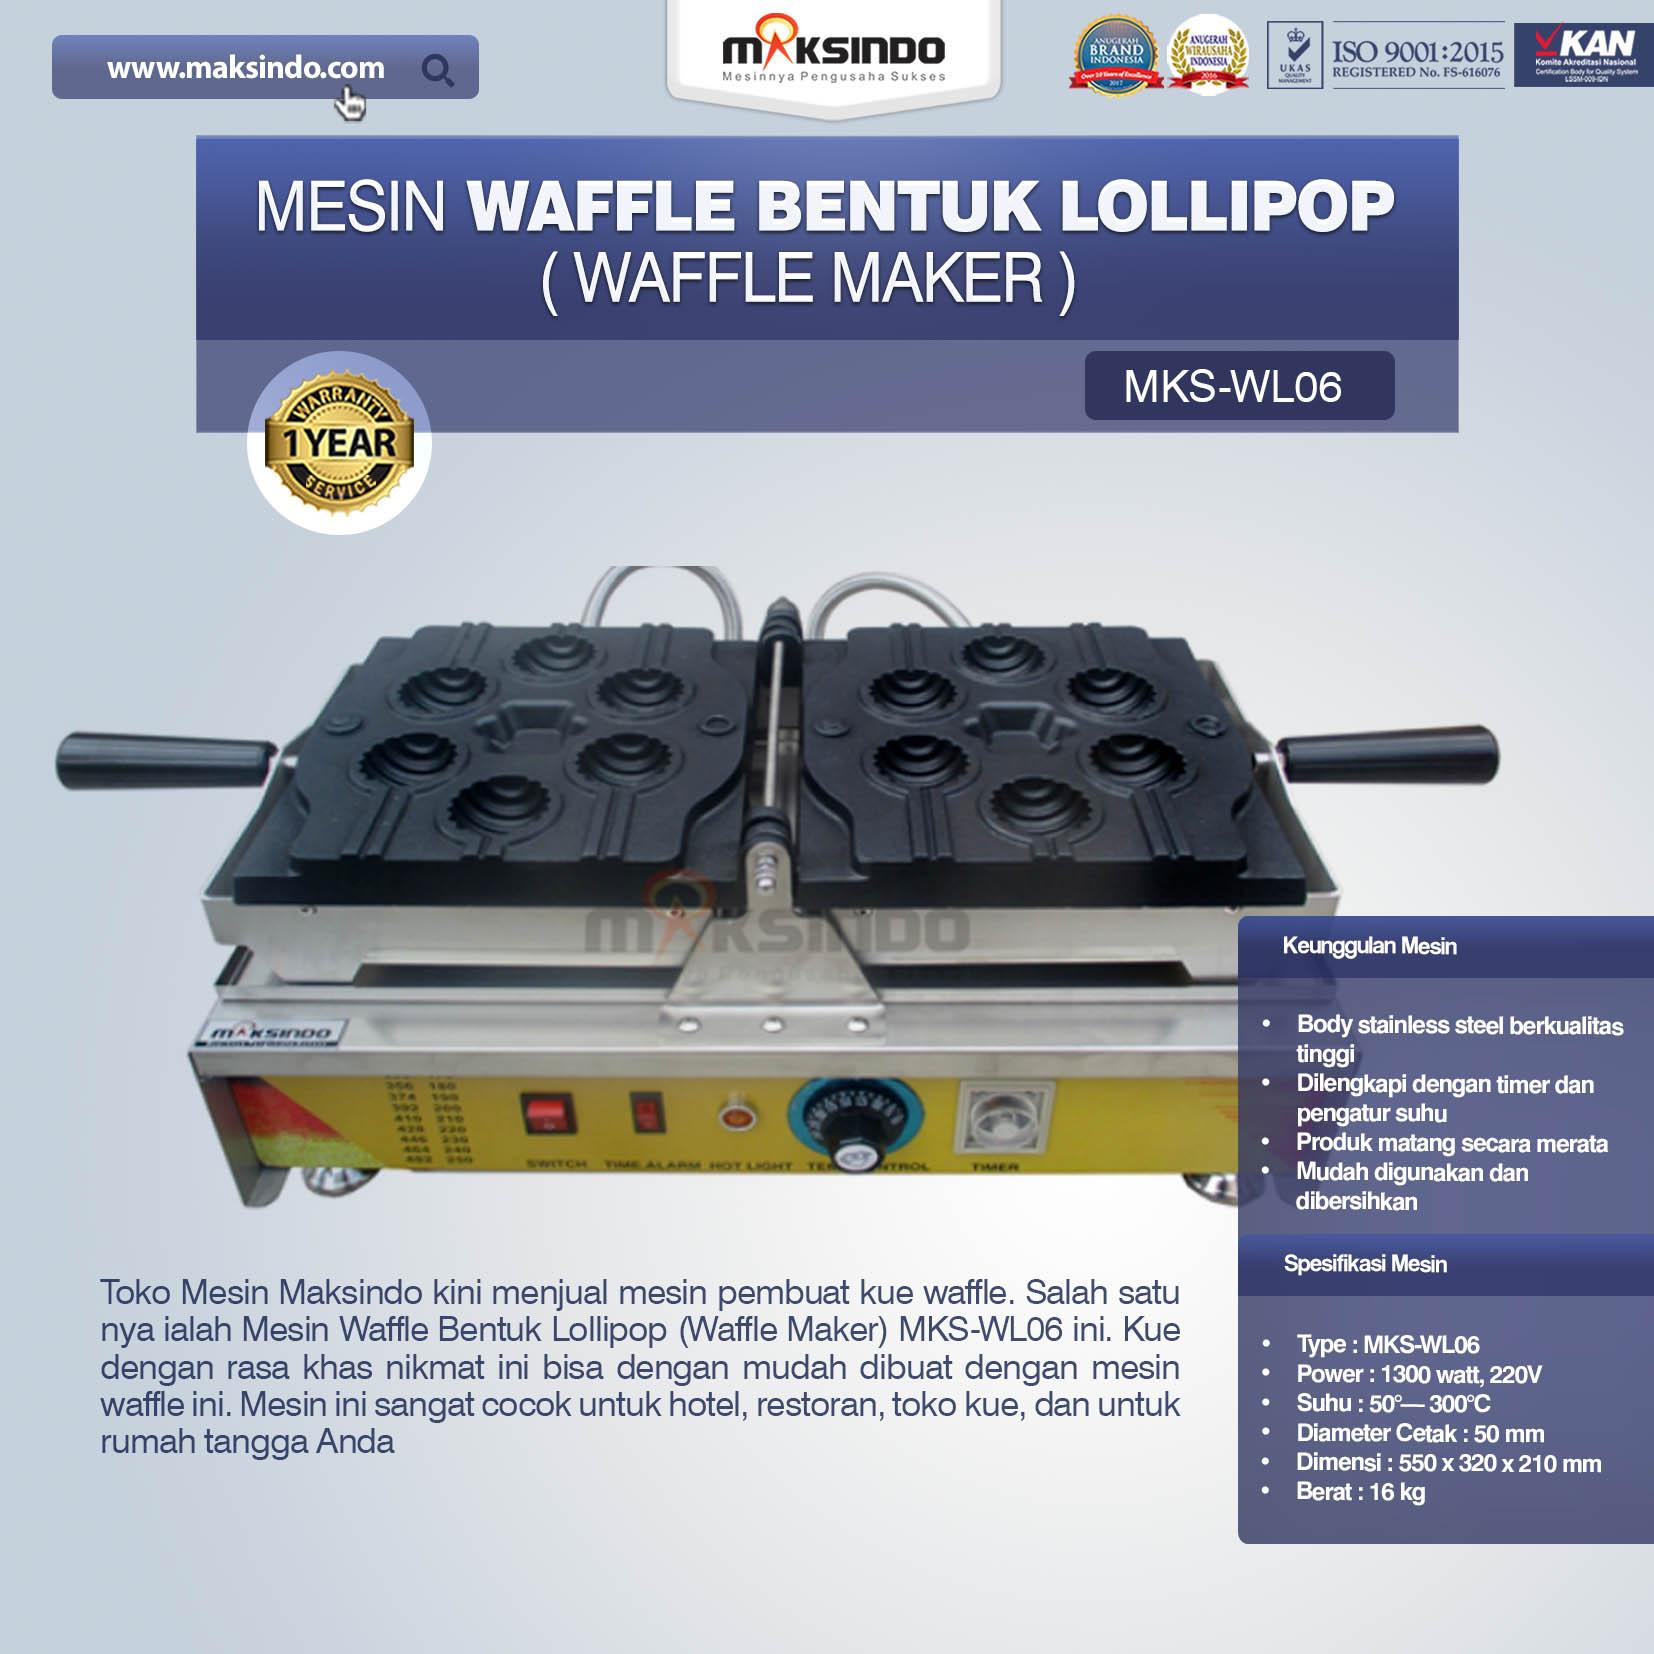 Jual Mesin Waffle Bentuk Lollipop (Waffle Maker) MKS-WL06 di Pekanbaru